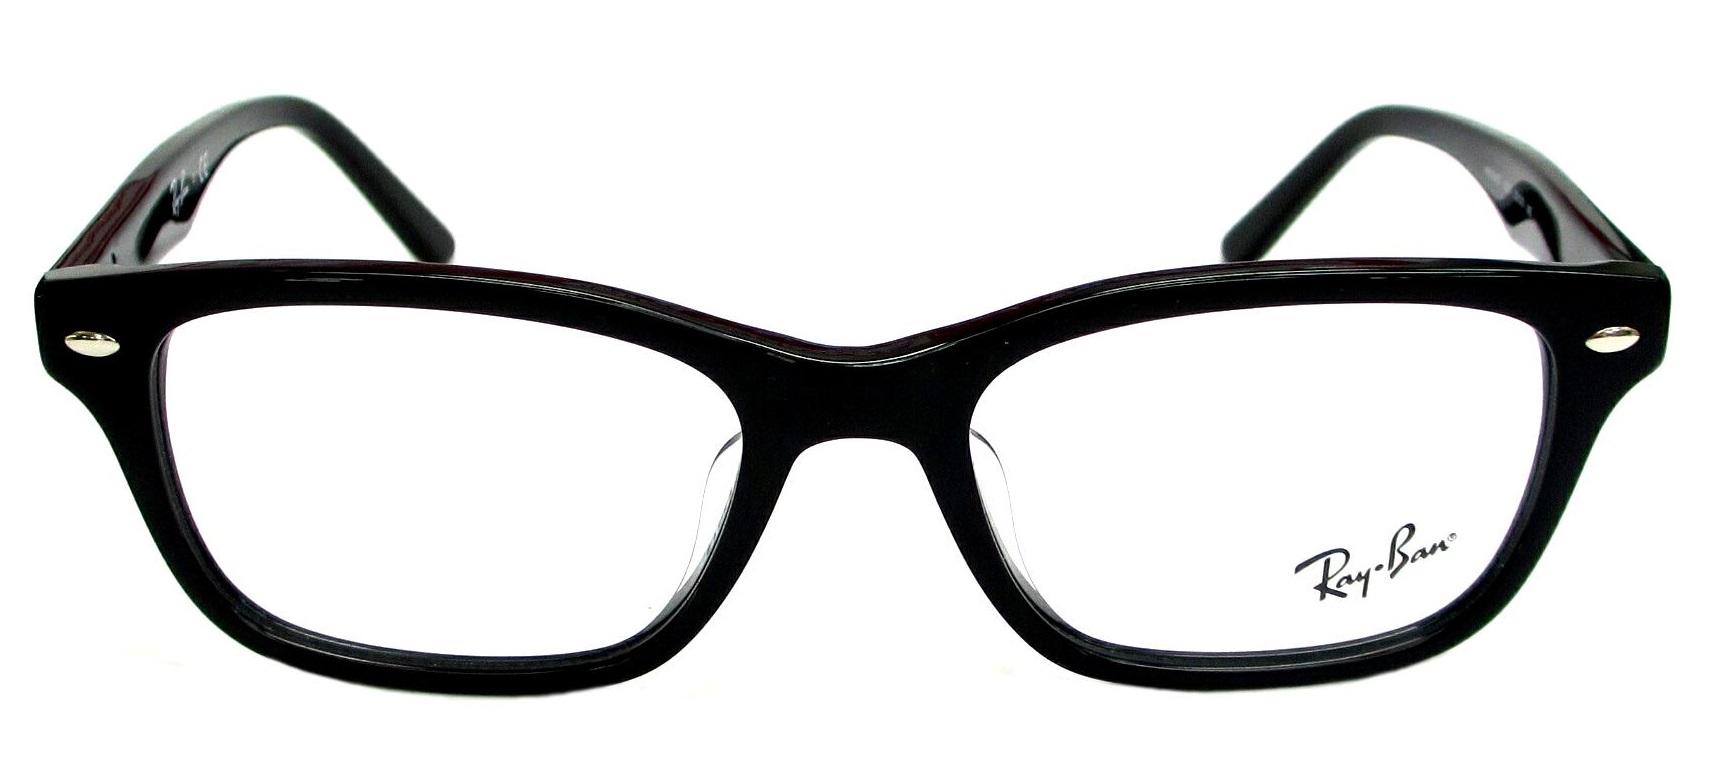 RayBan RX5345D 2000 Black Frame Eyeglasses